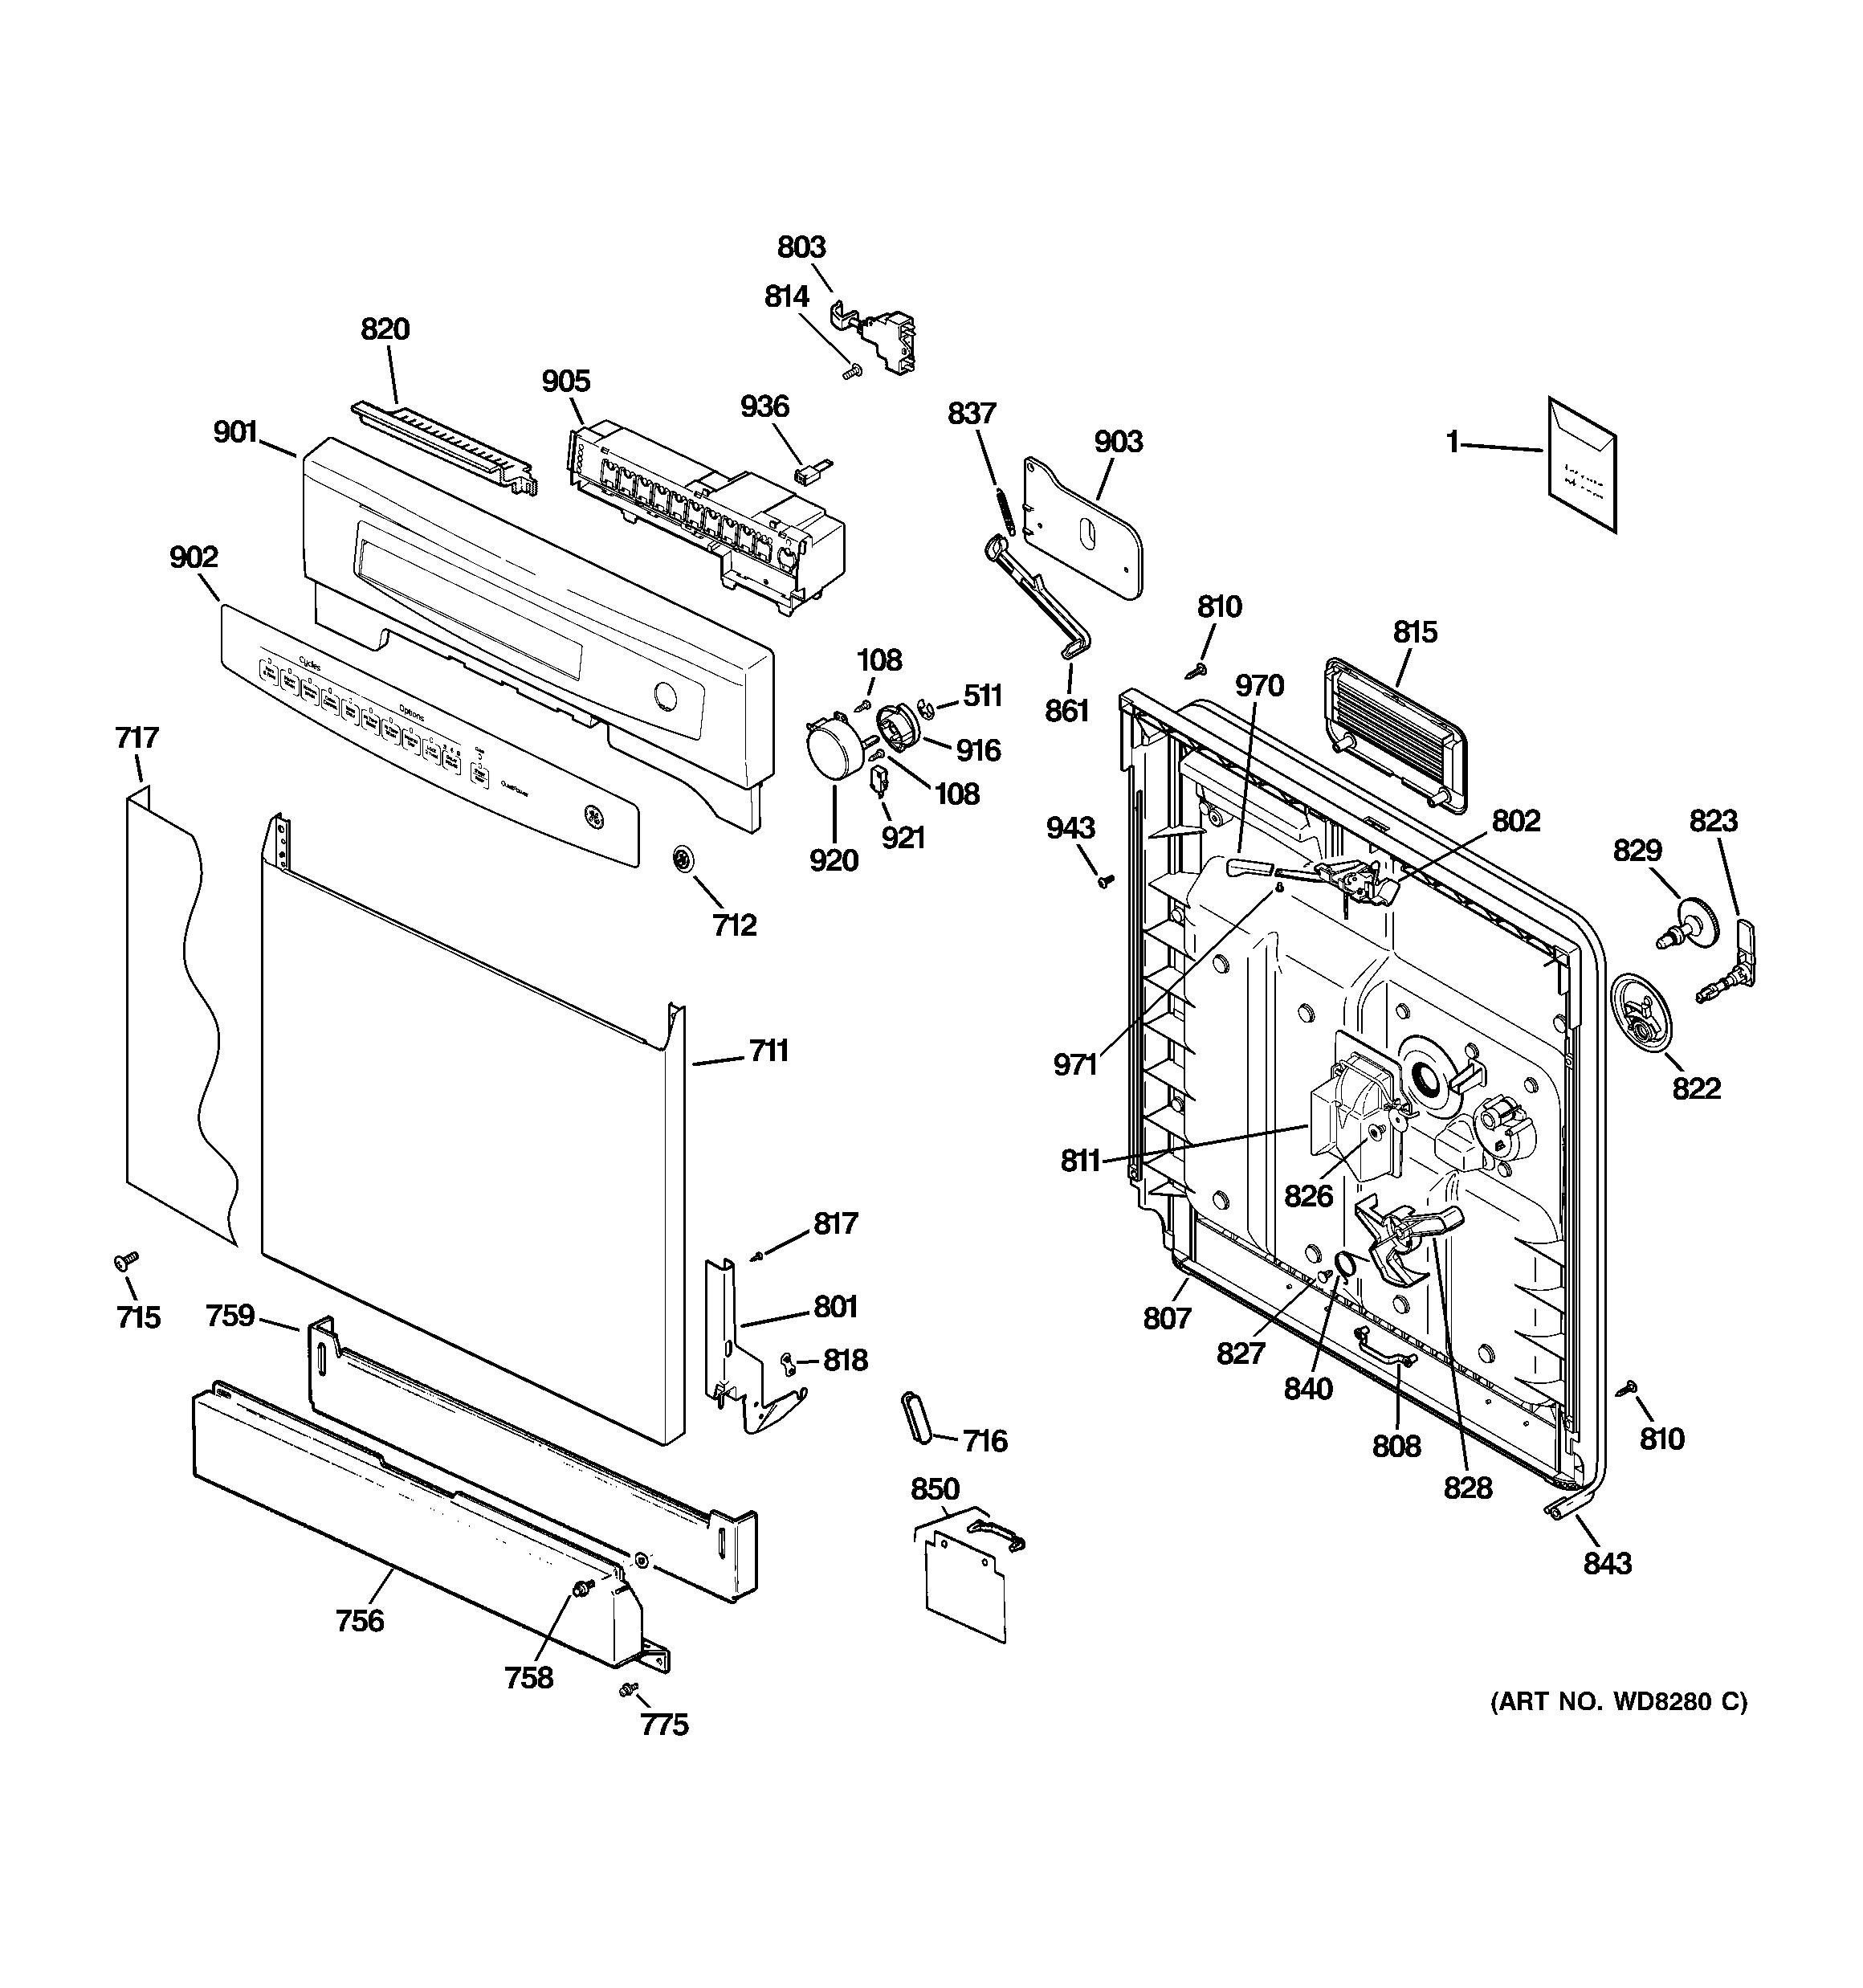 ge profile range wiring diagram nuatilus ge dishwasher wiring diagrams wiring diagram schematics  nuatilus ge dishwasher wiring diagrams